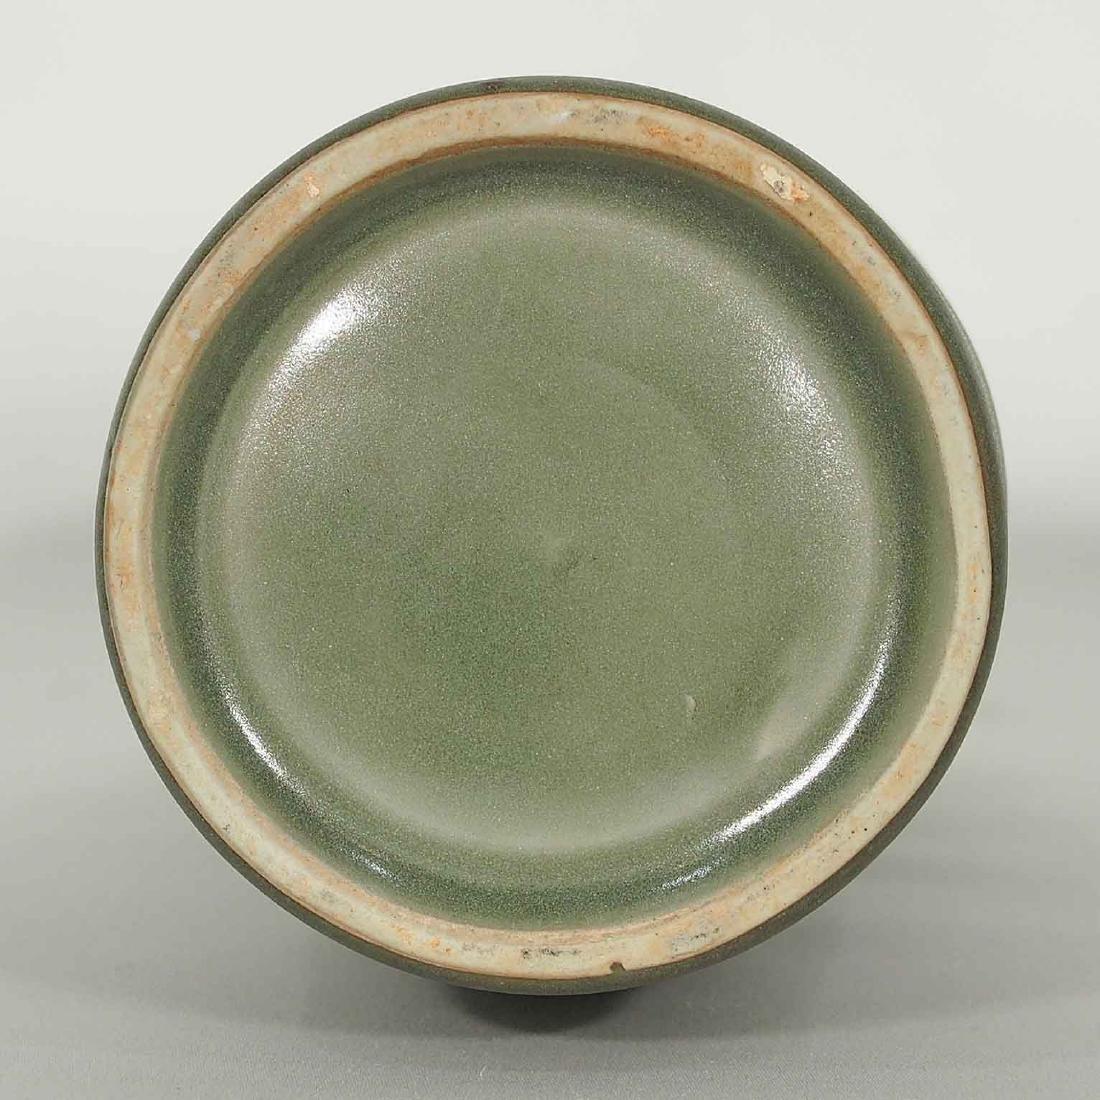 Longquan 'Kinuta' Mallet Vase, Southern Song Dynasty - 8